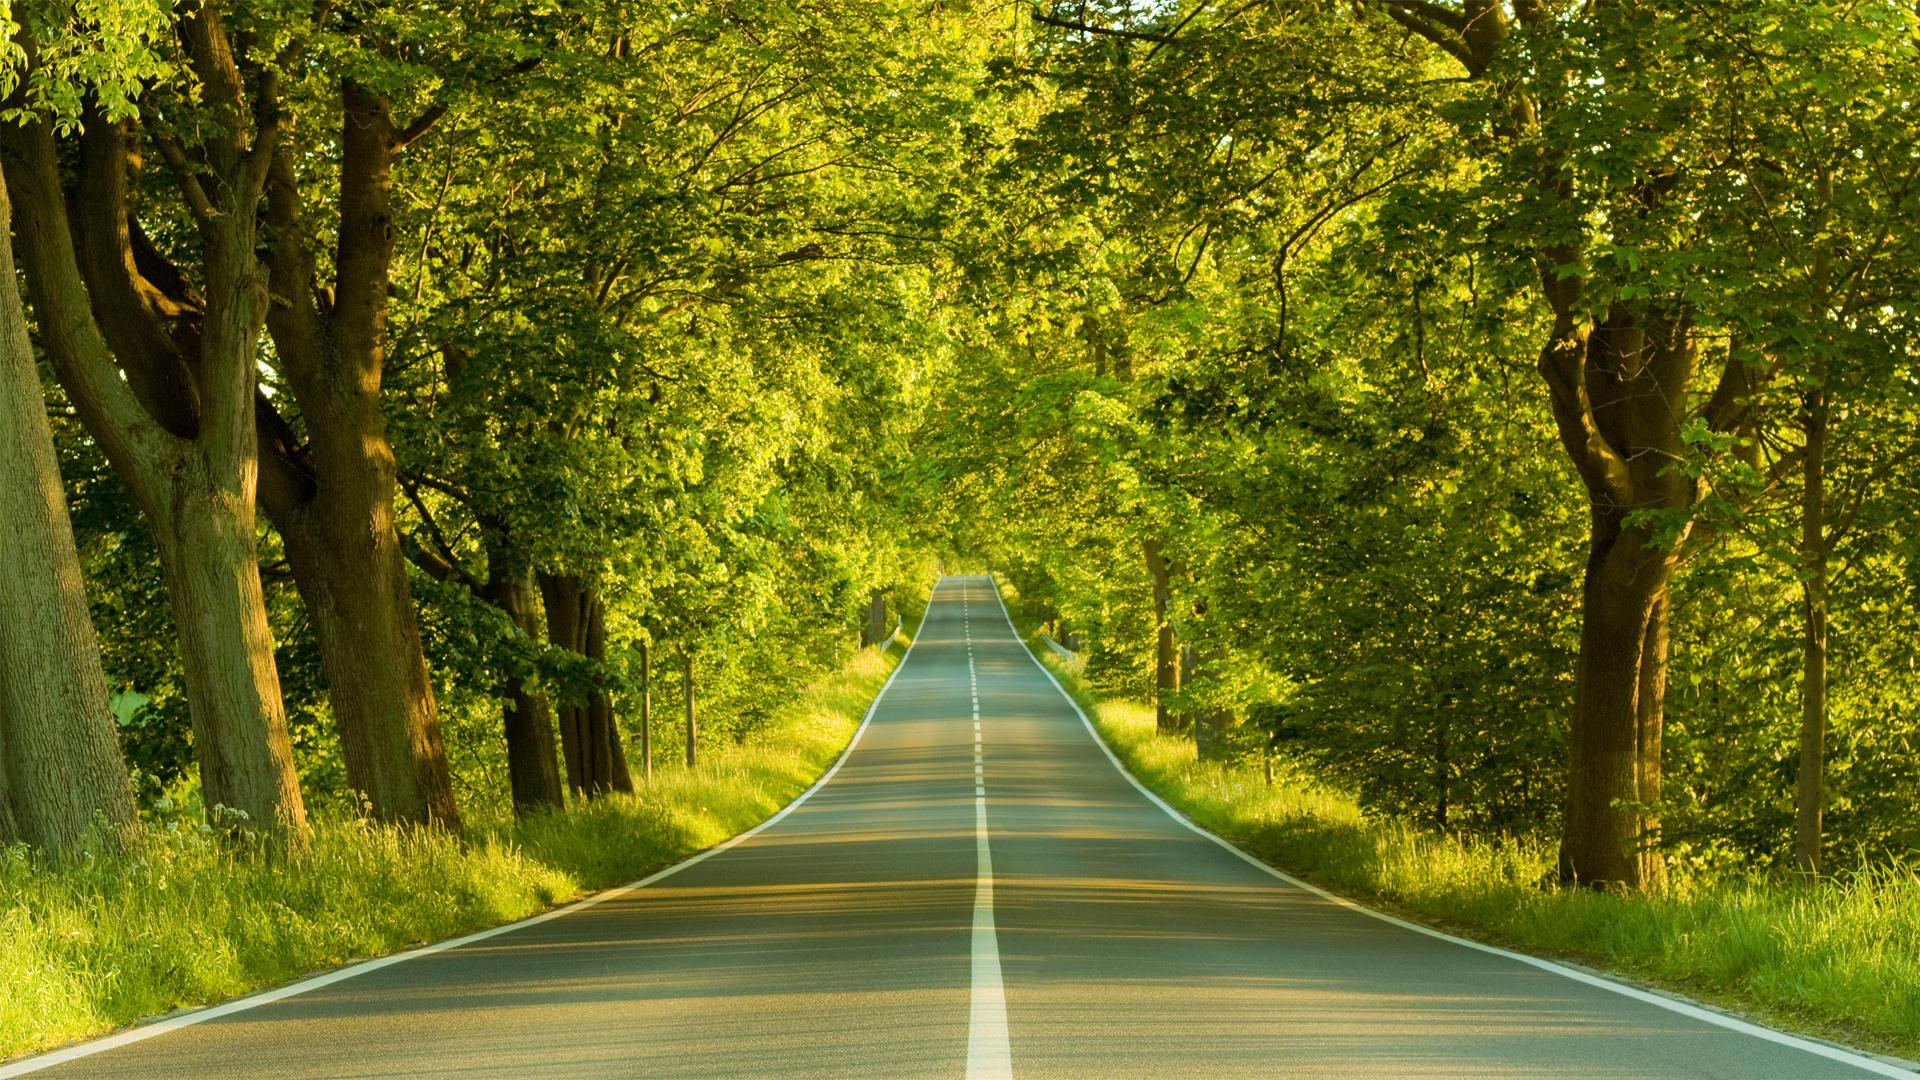 Landscapes Nature Wallpaper 1920x1080 Landscapes Nature Trees Roads 1920x1080